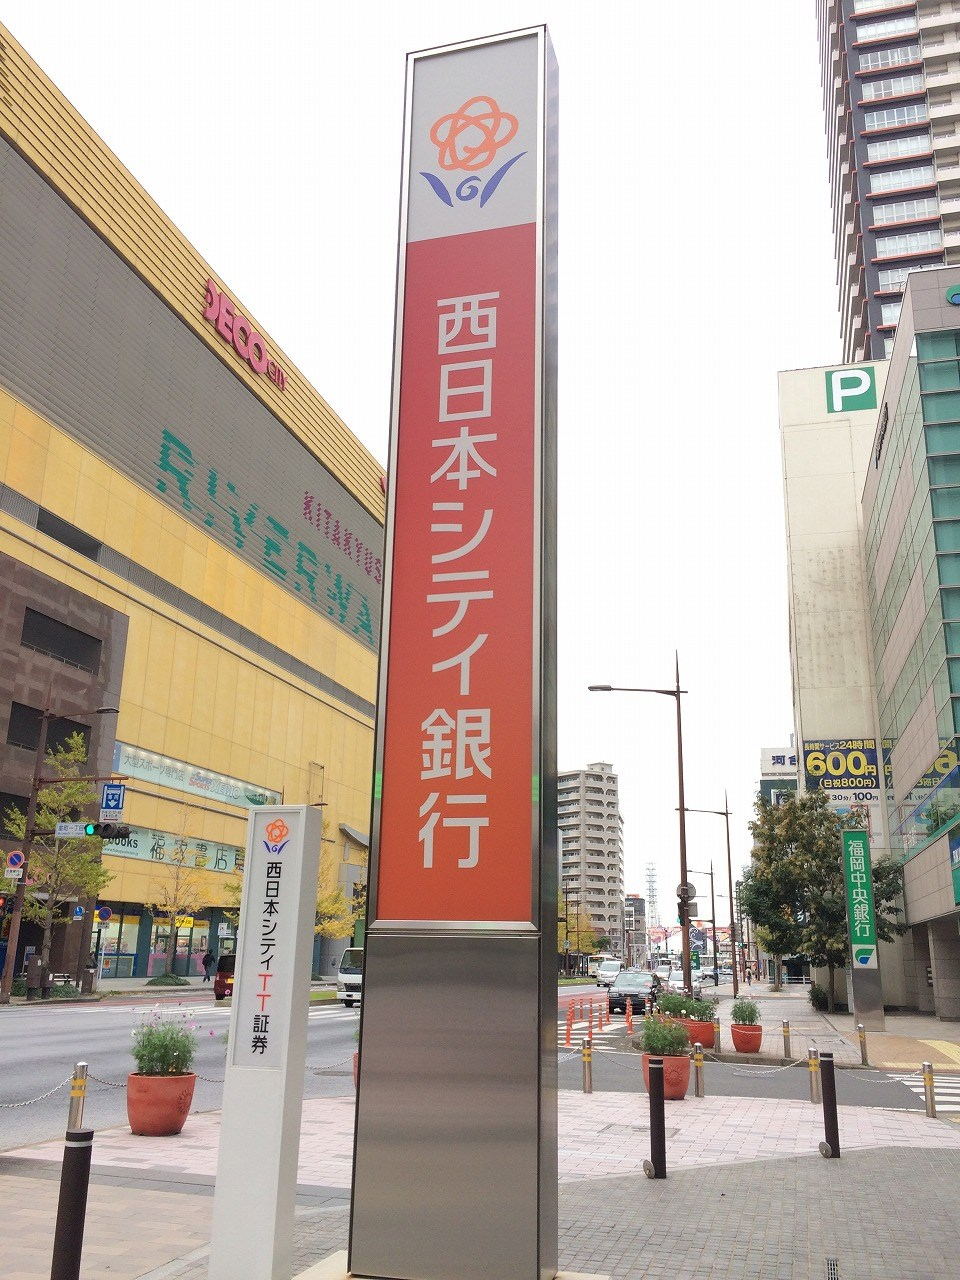 銀行:西日本シティ銀行黒崎支店 928m